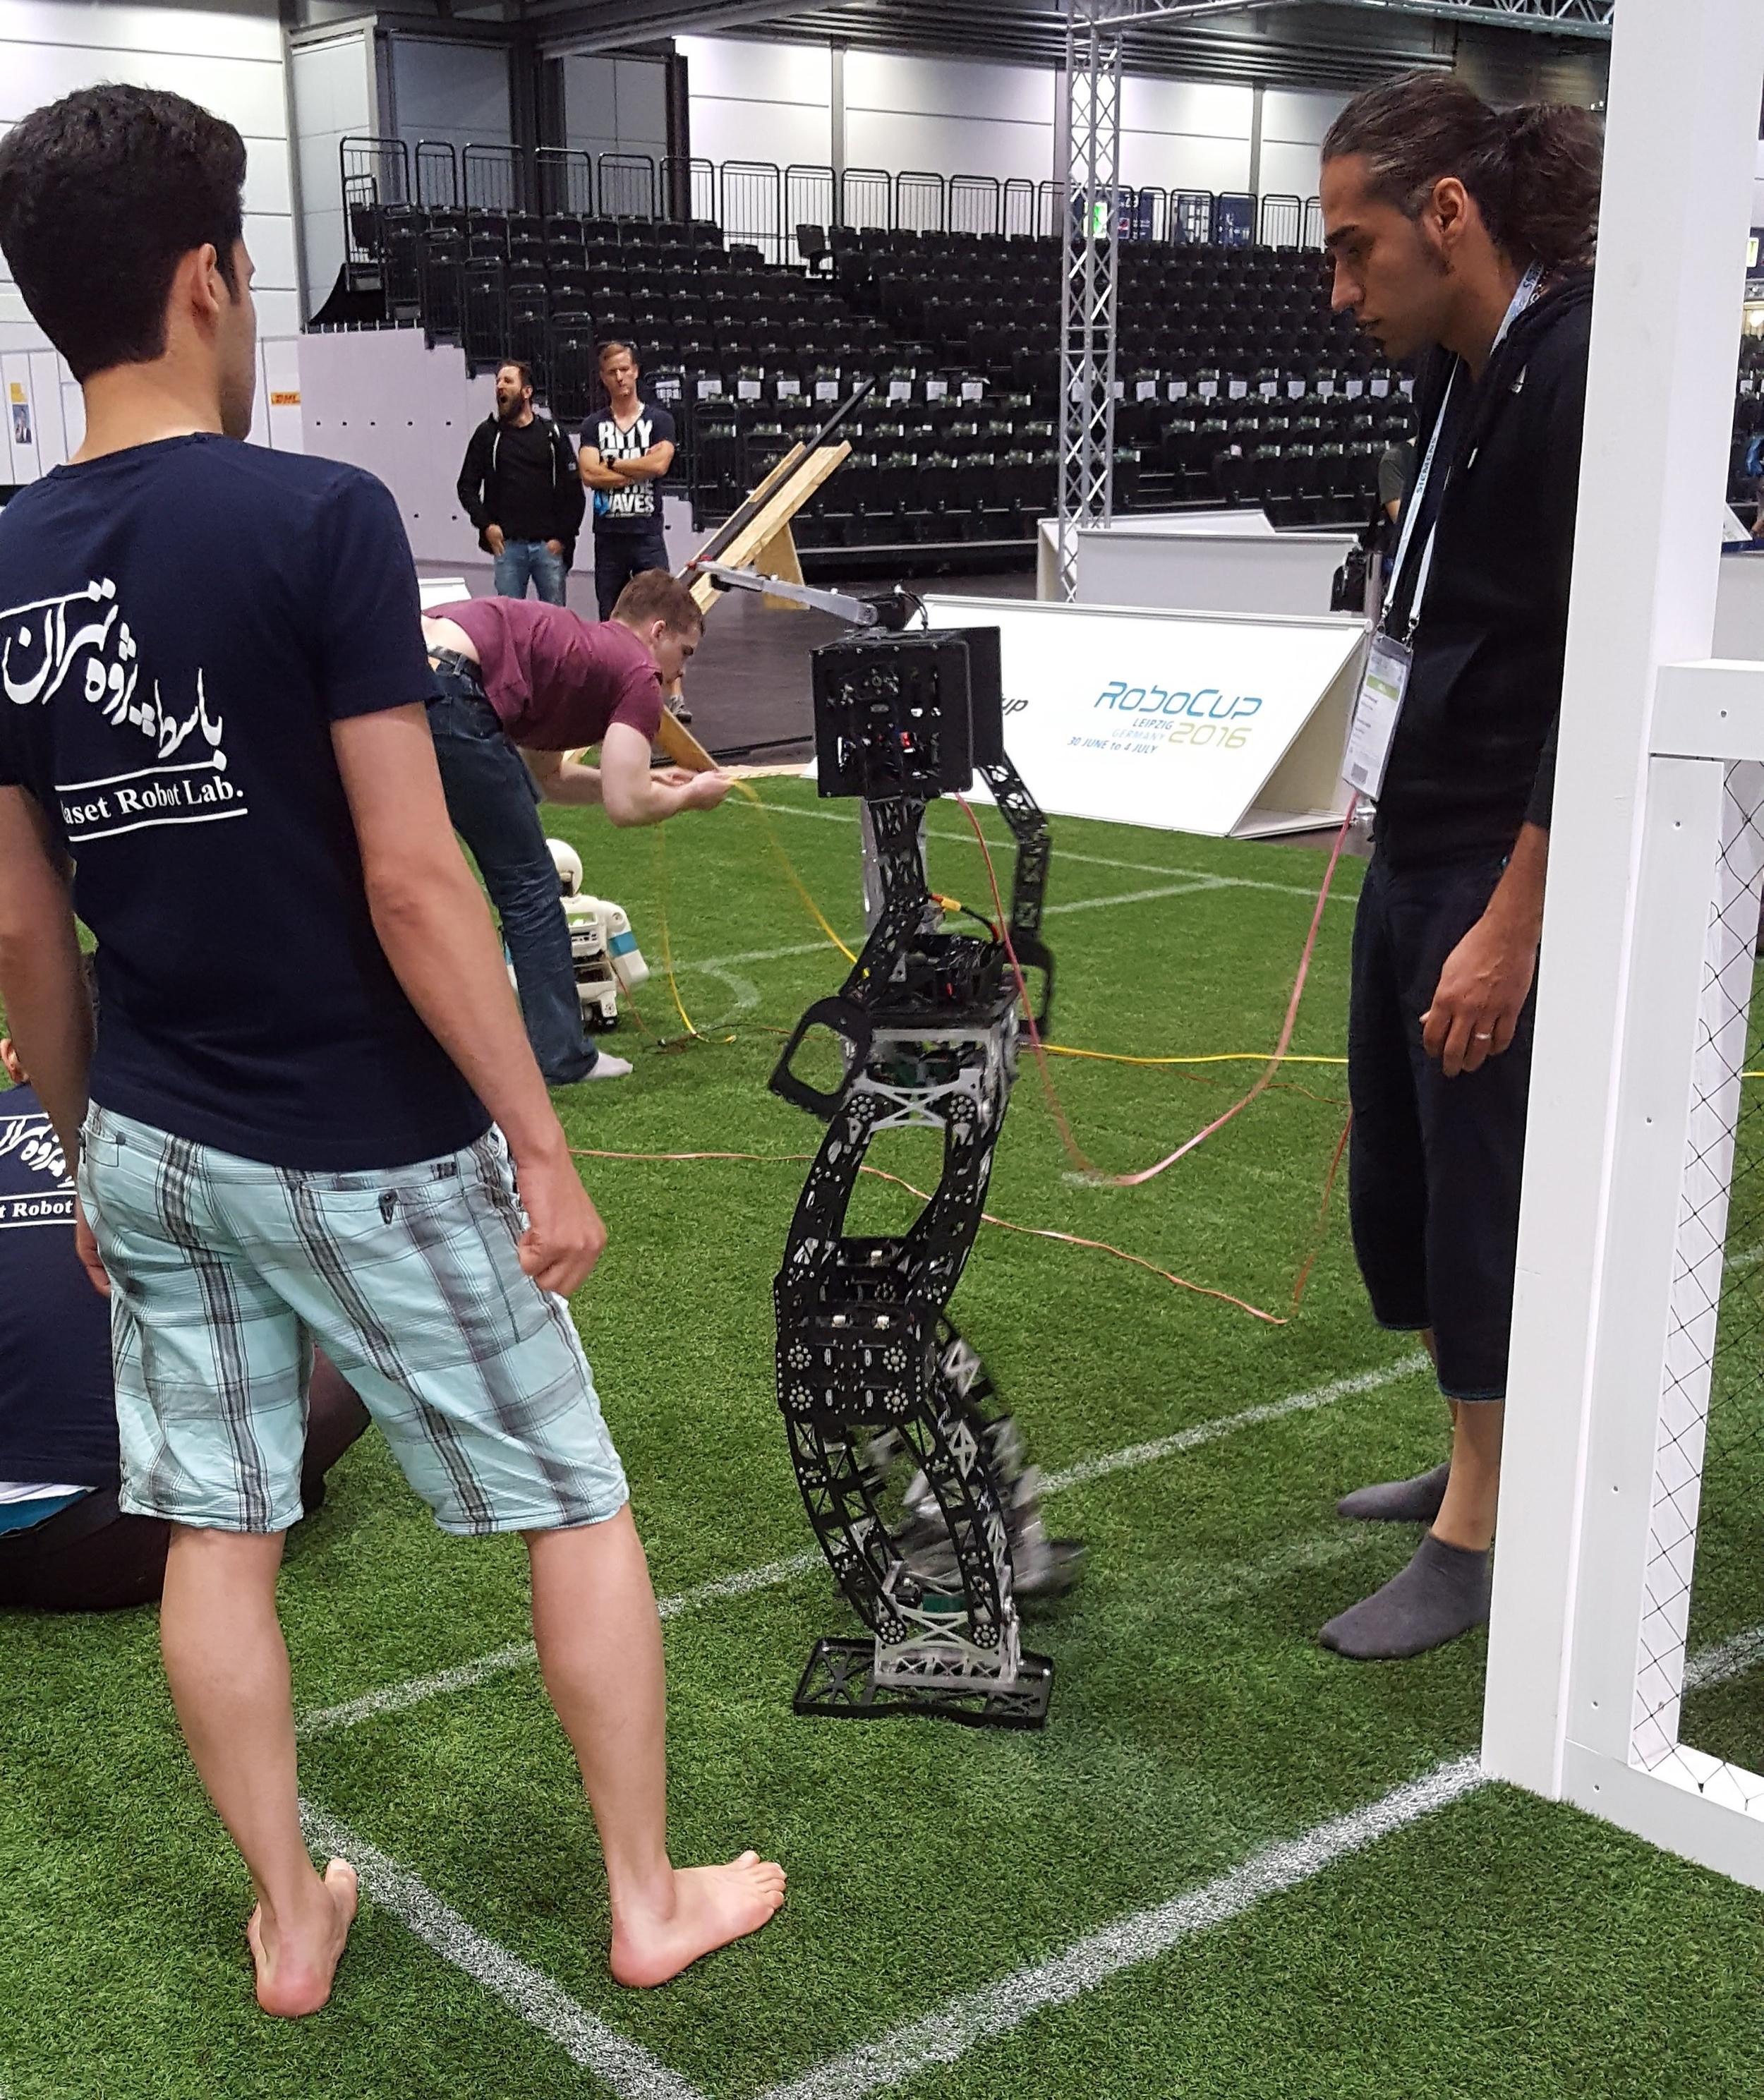 Adult Sized Humanoid League Robot